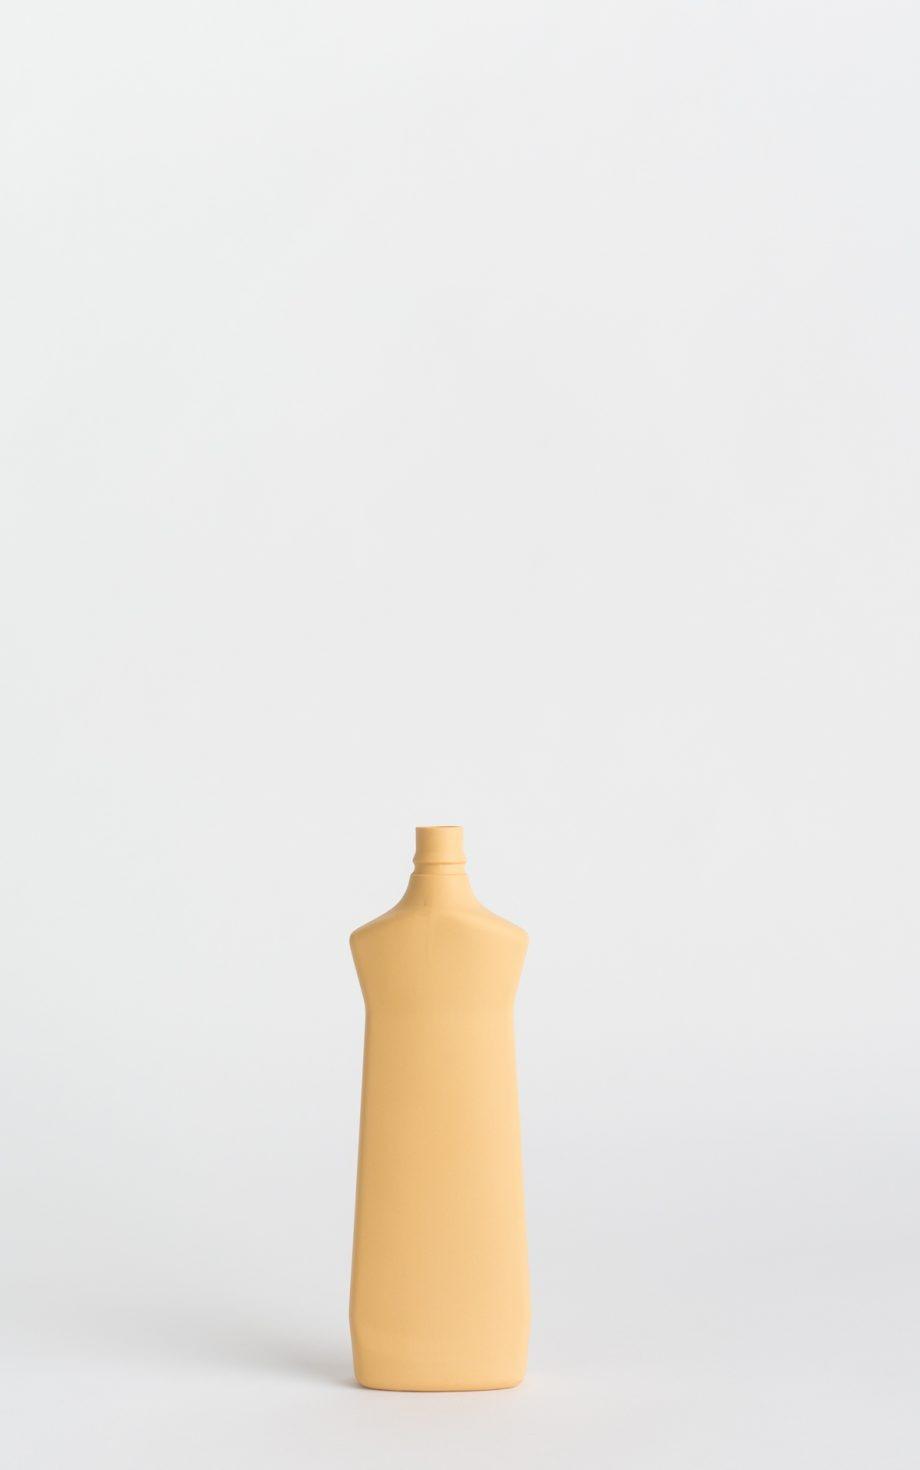 bottle vase #1 warm yellow